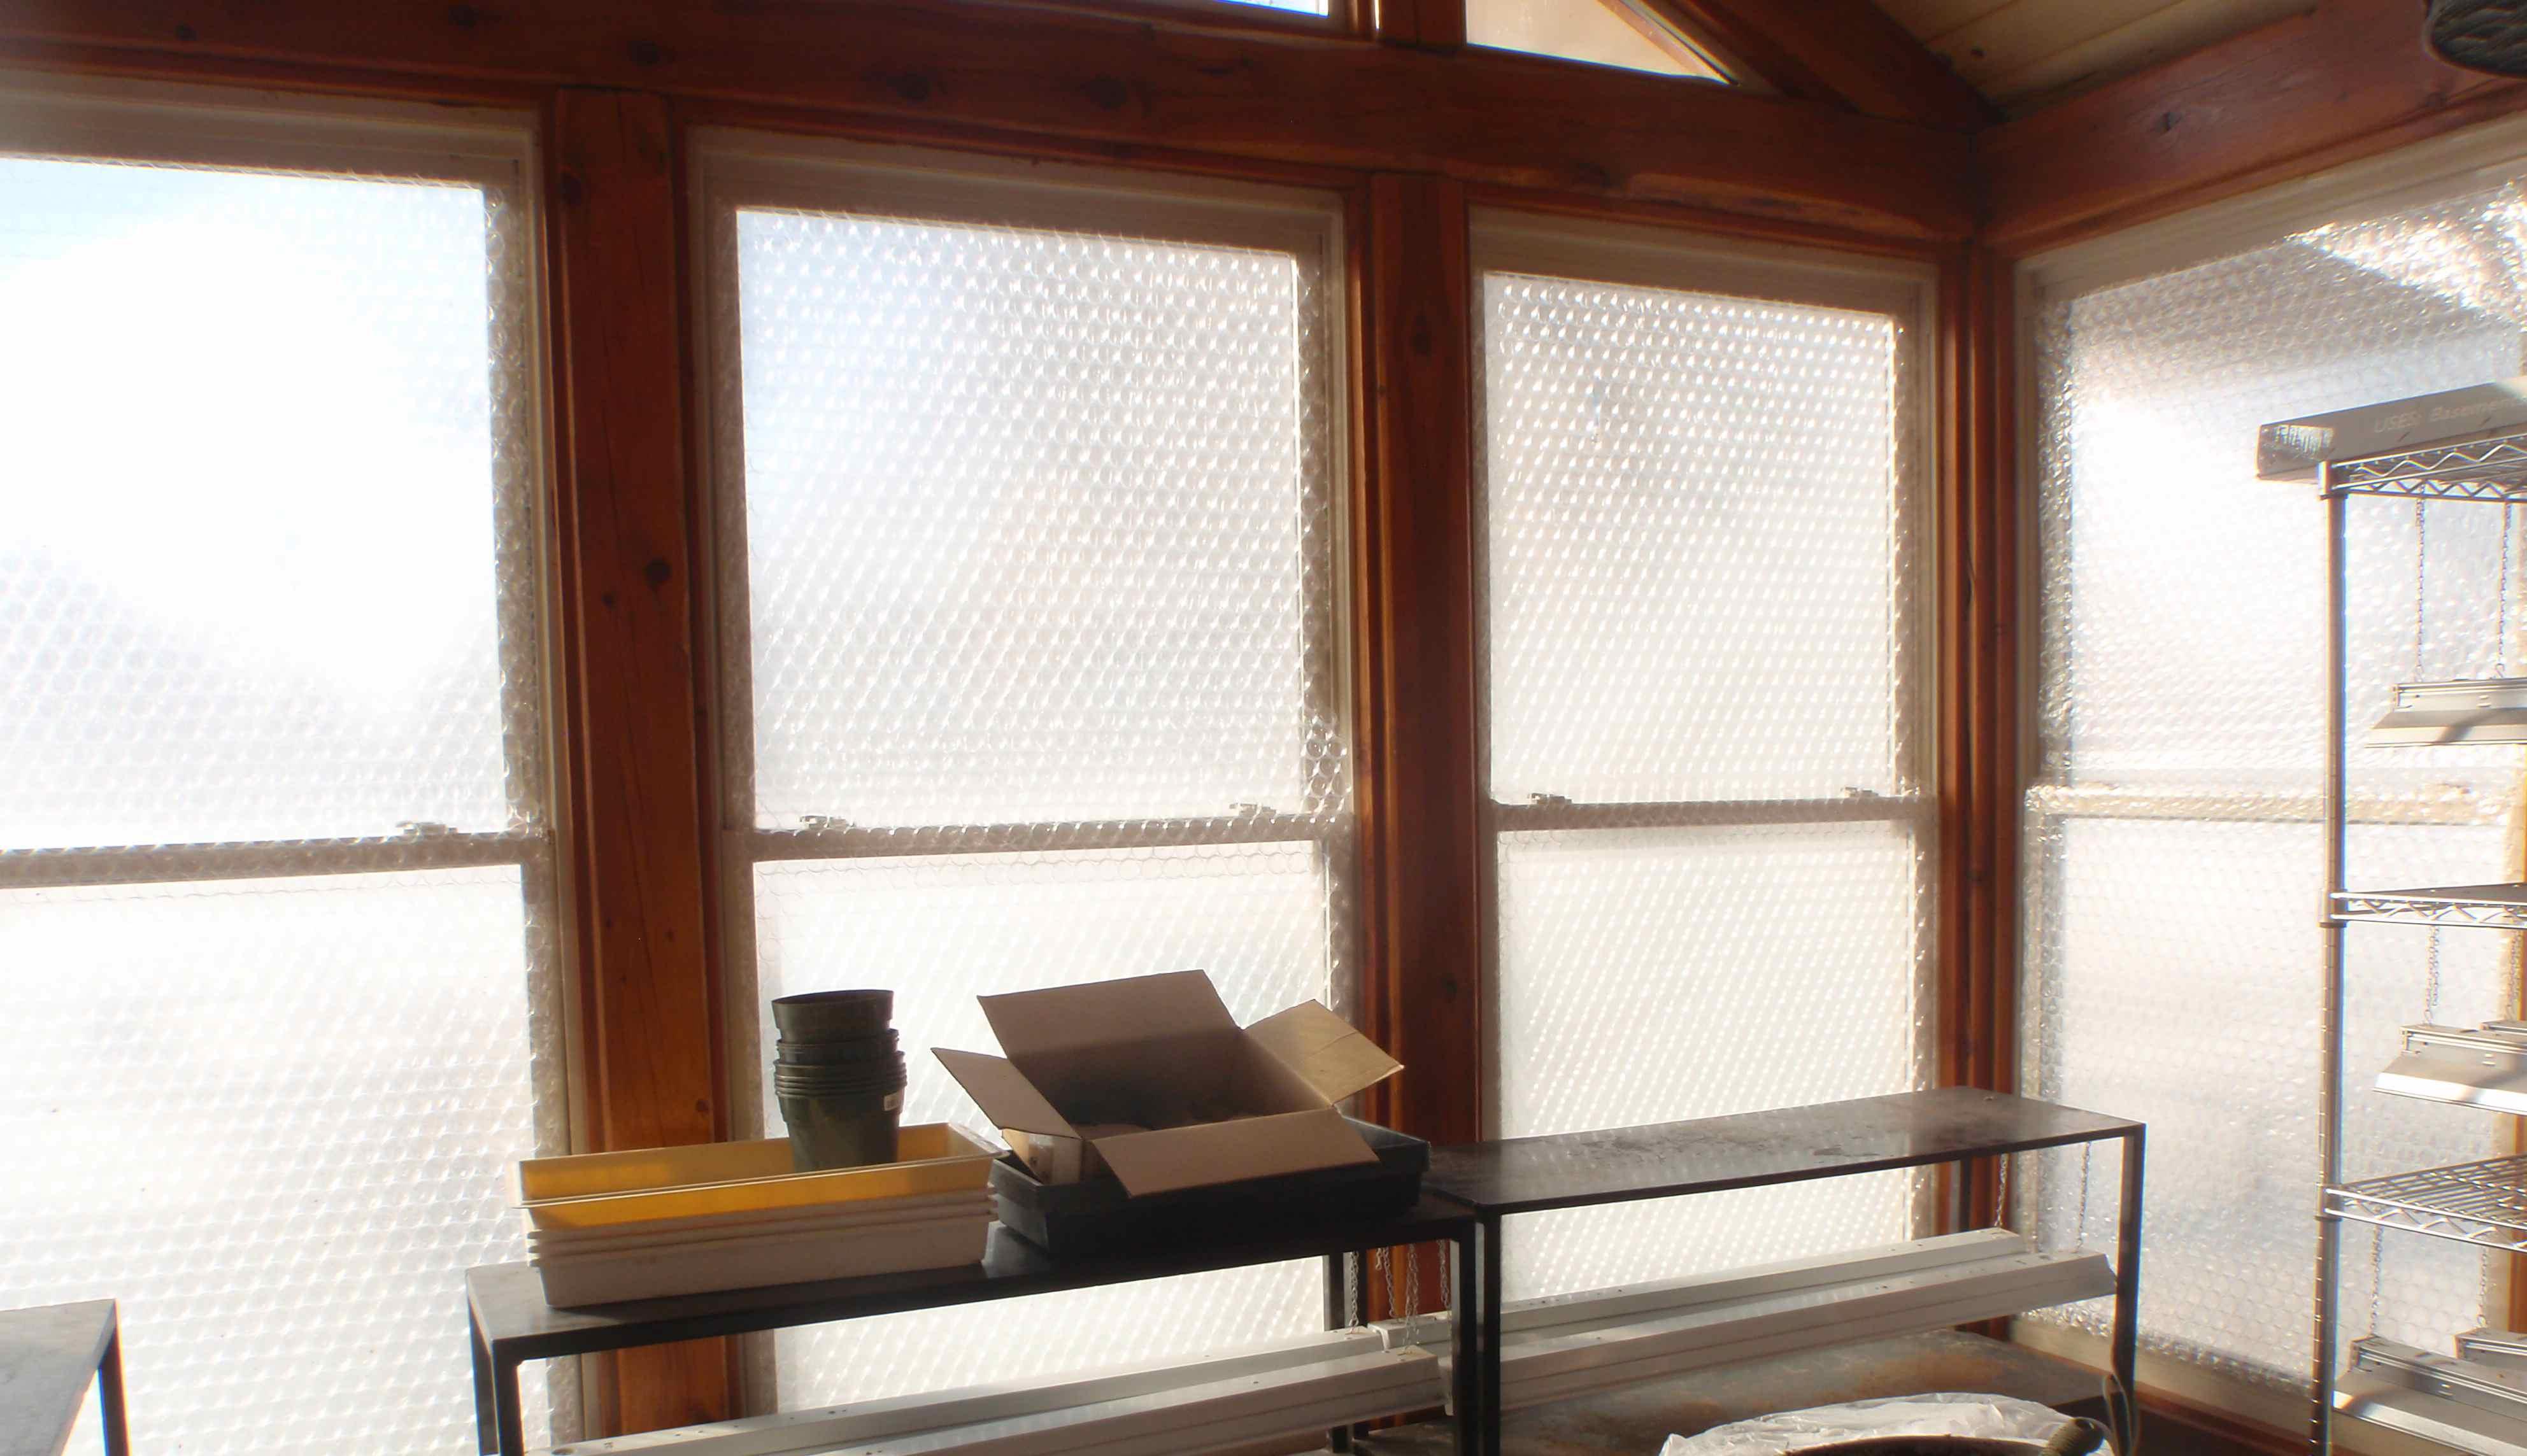 Bubble Wrap On Windows Still Lets A Lot Of Light In